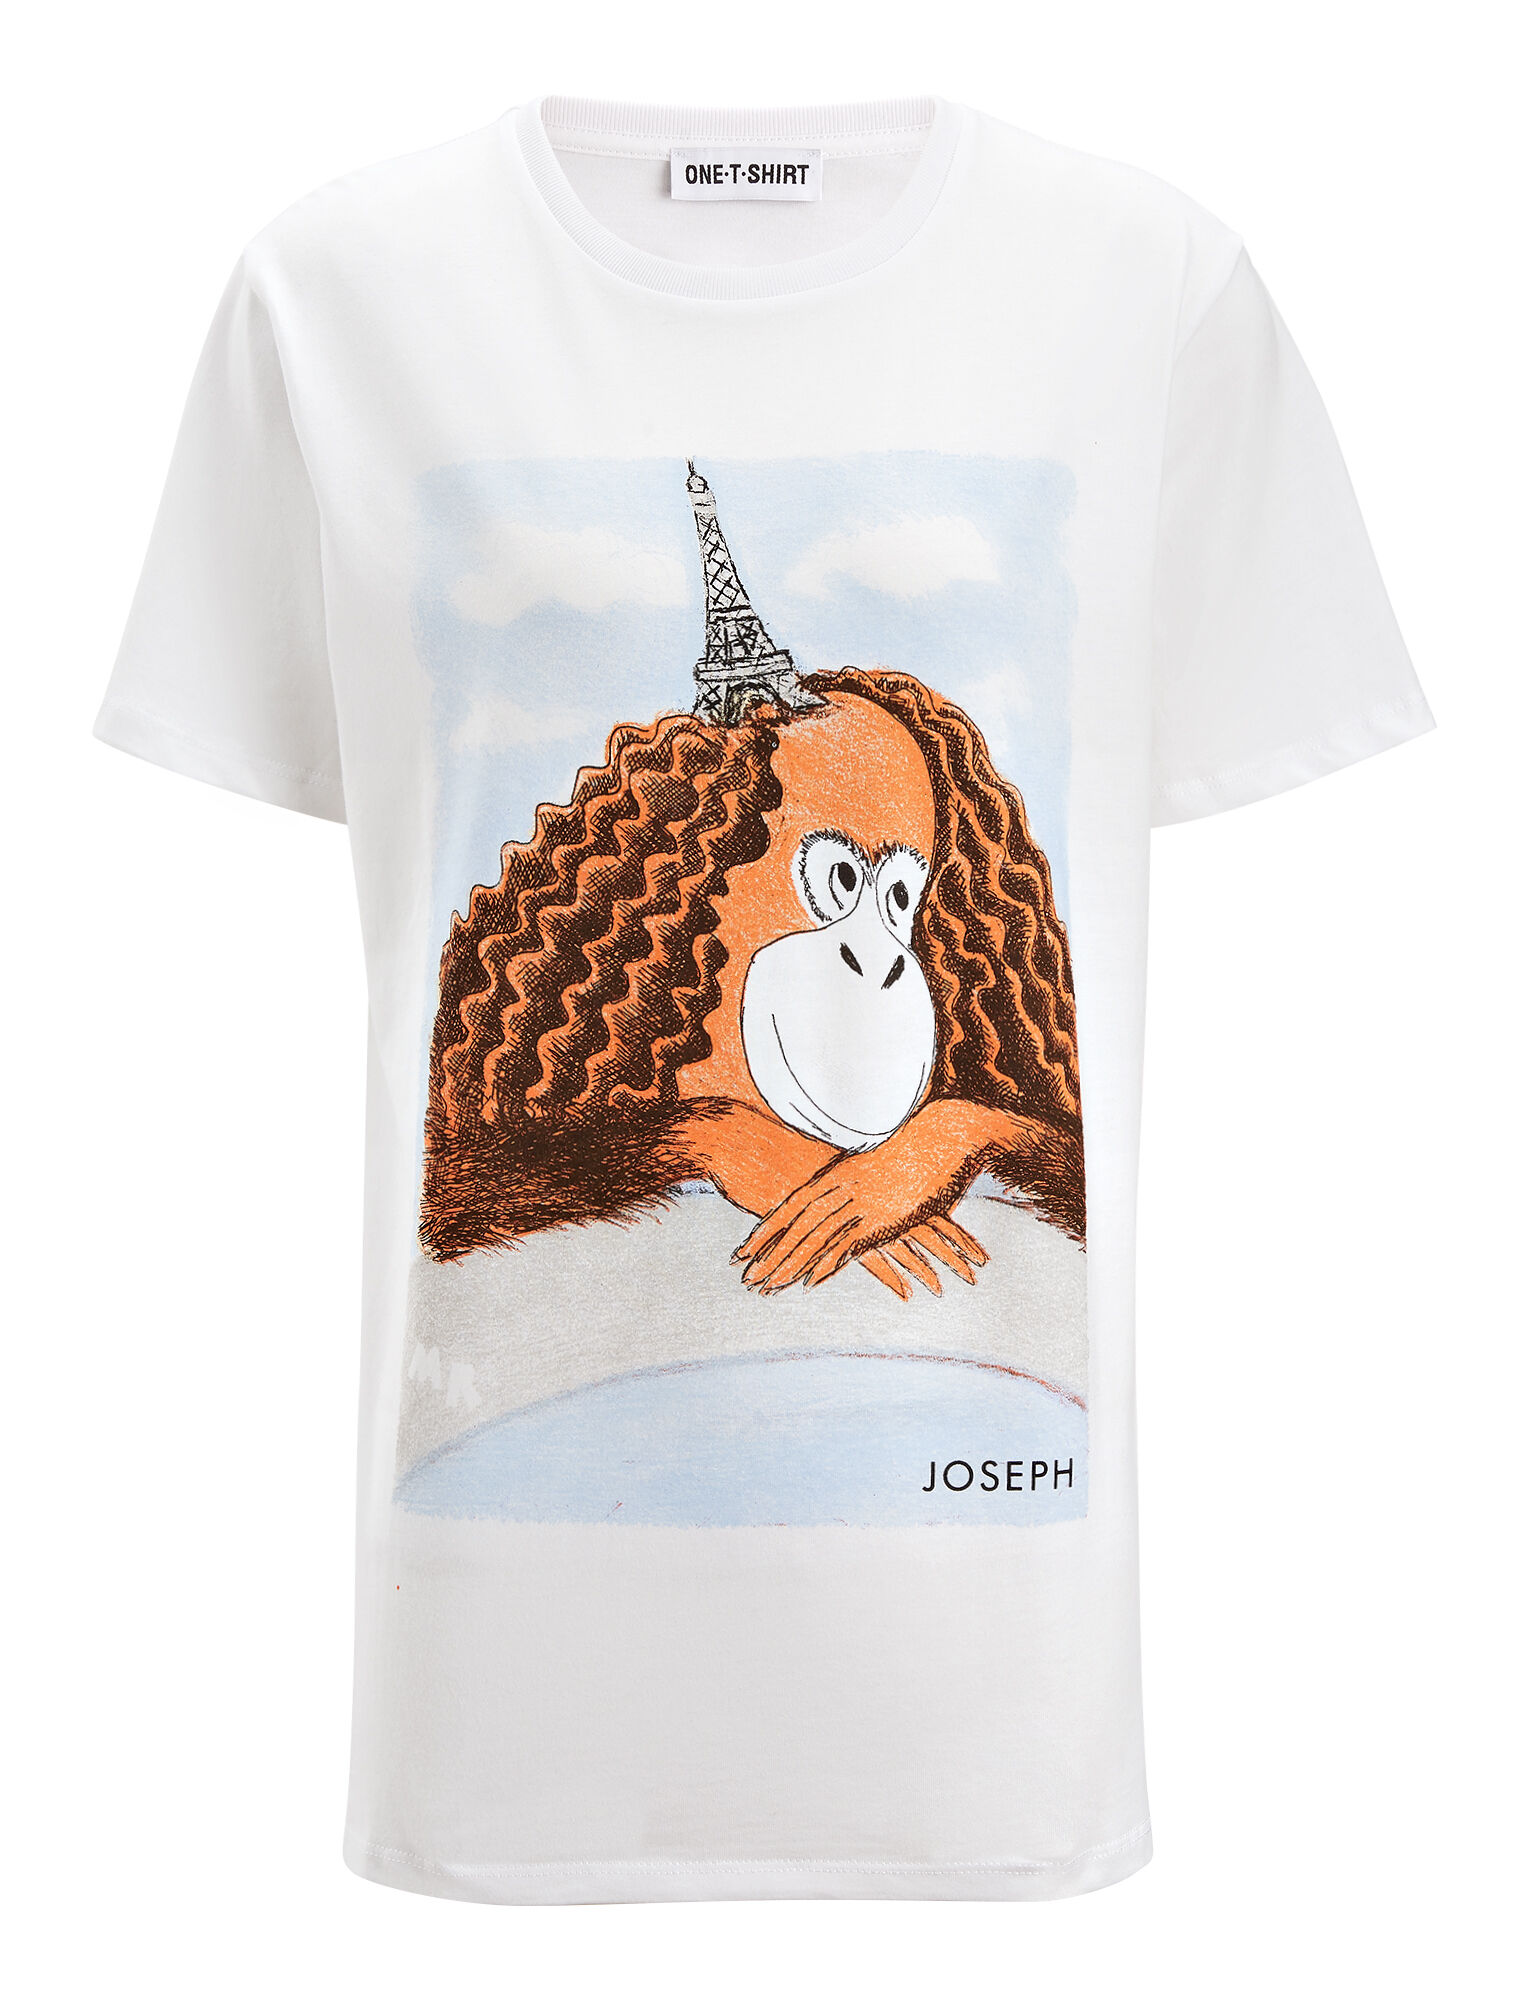 Joseph, GingerNutz Tower Hat Tee, in WHITE